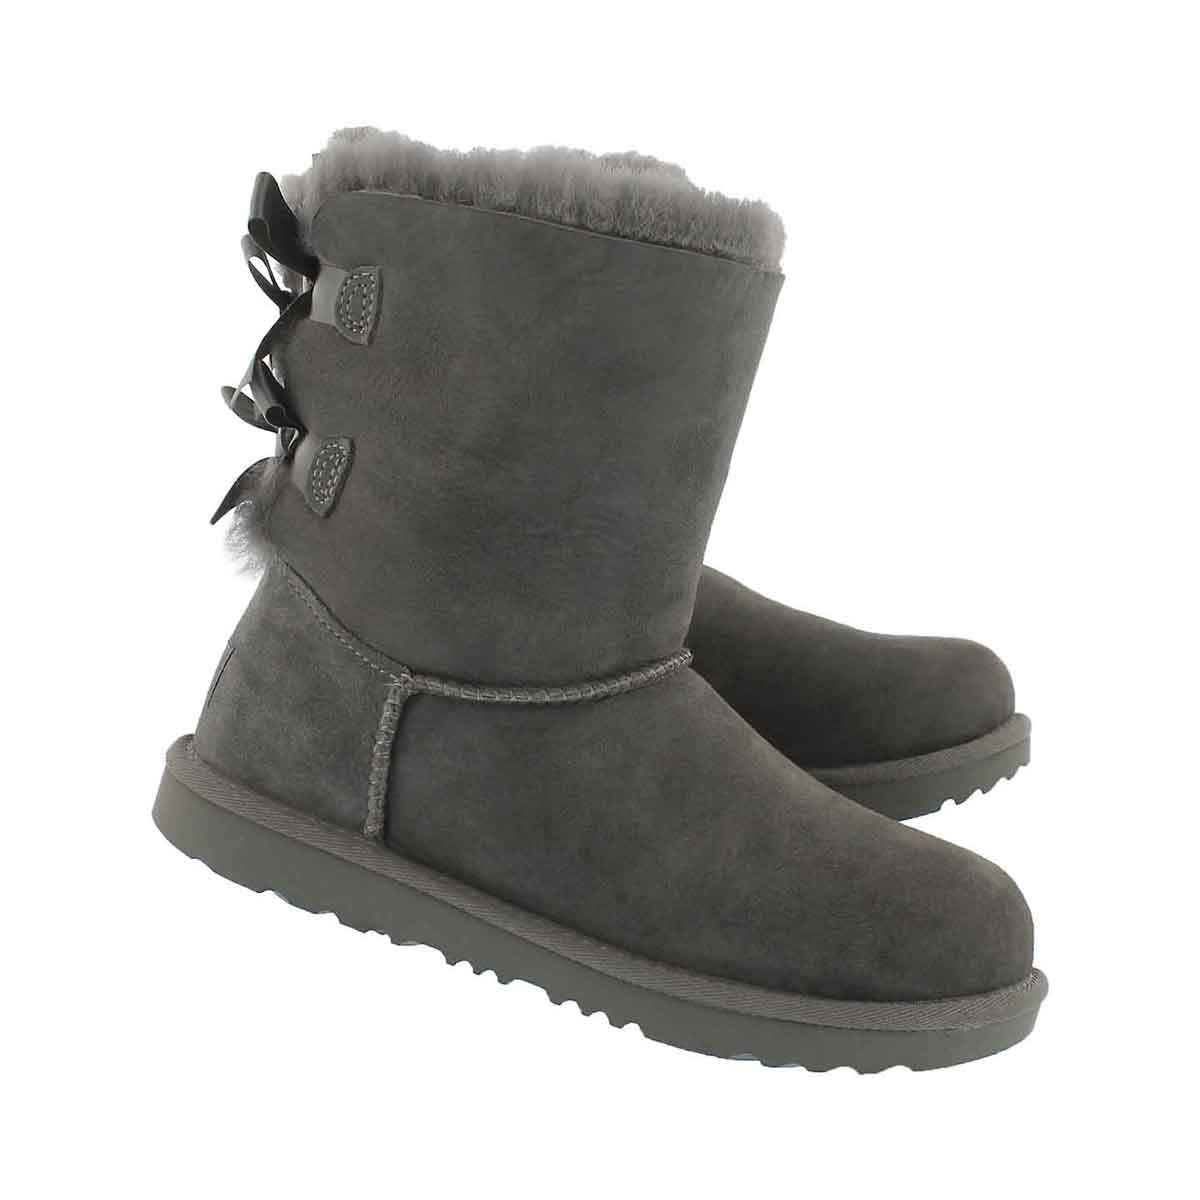 Grls Bailey Bow II grey sheepskin boot